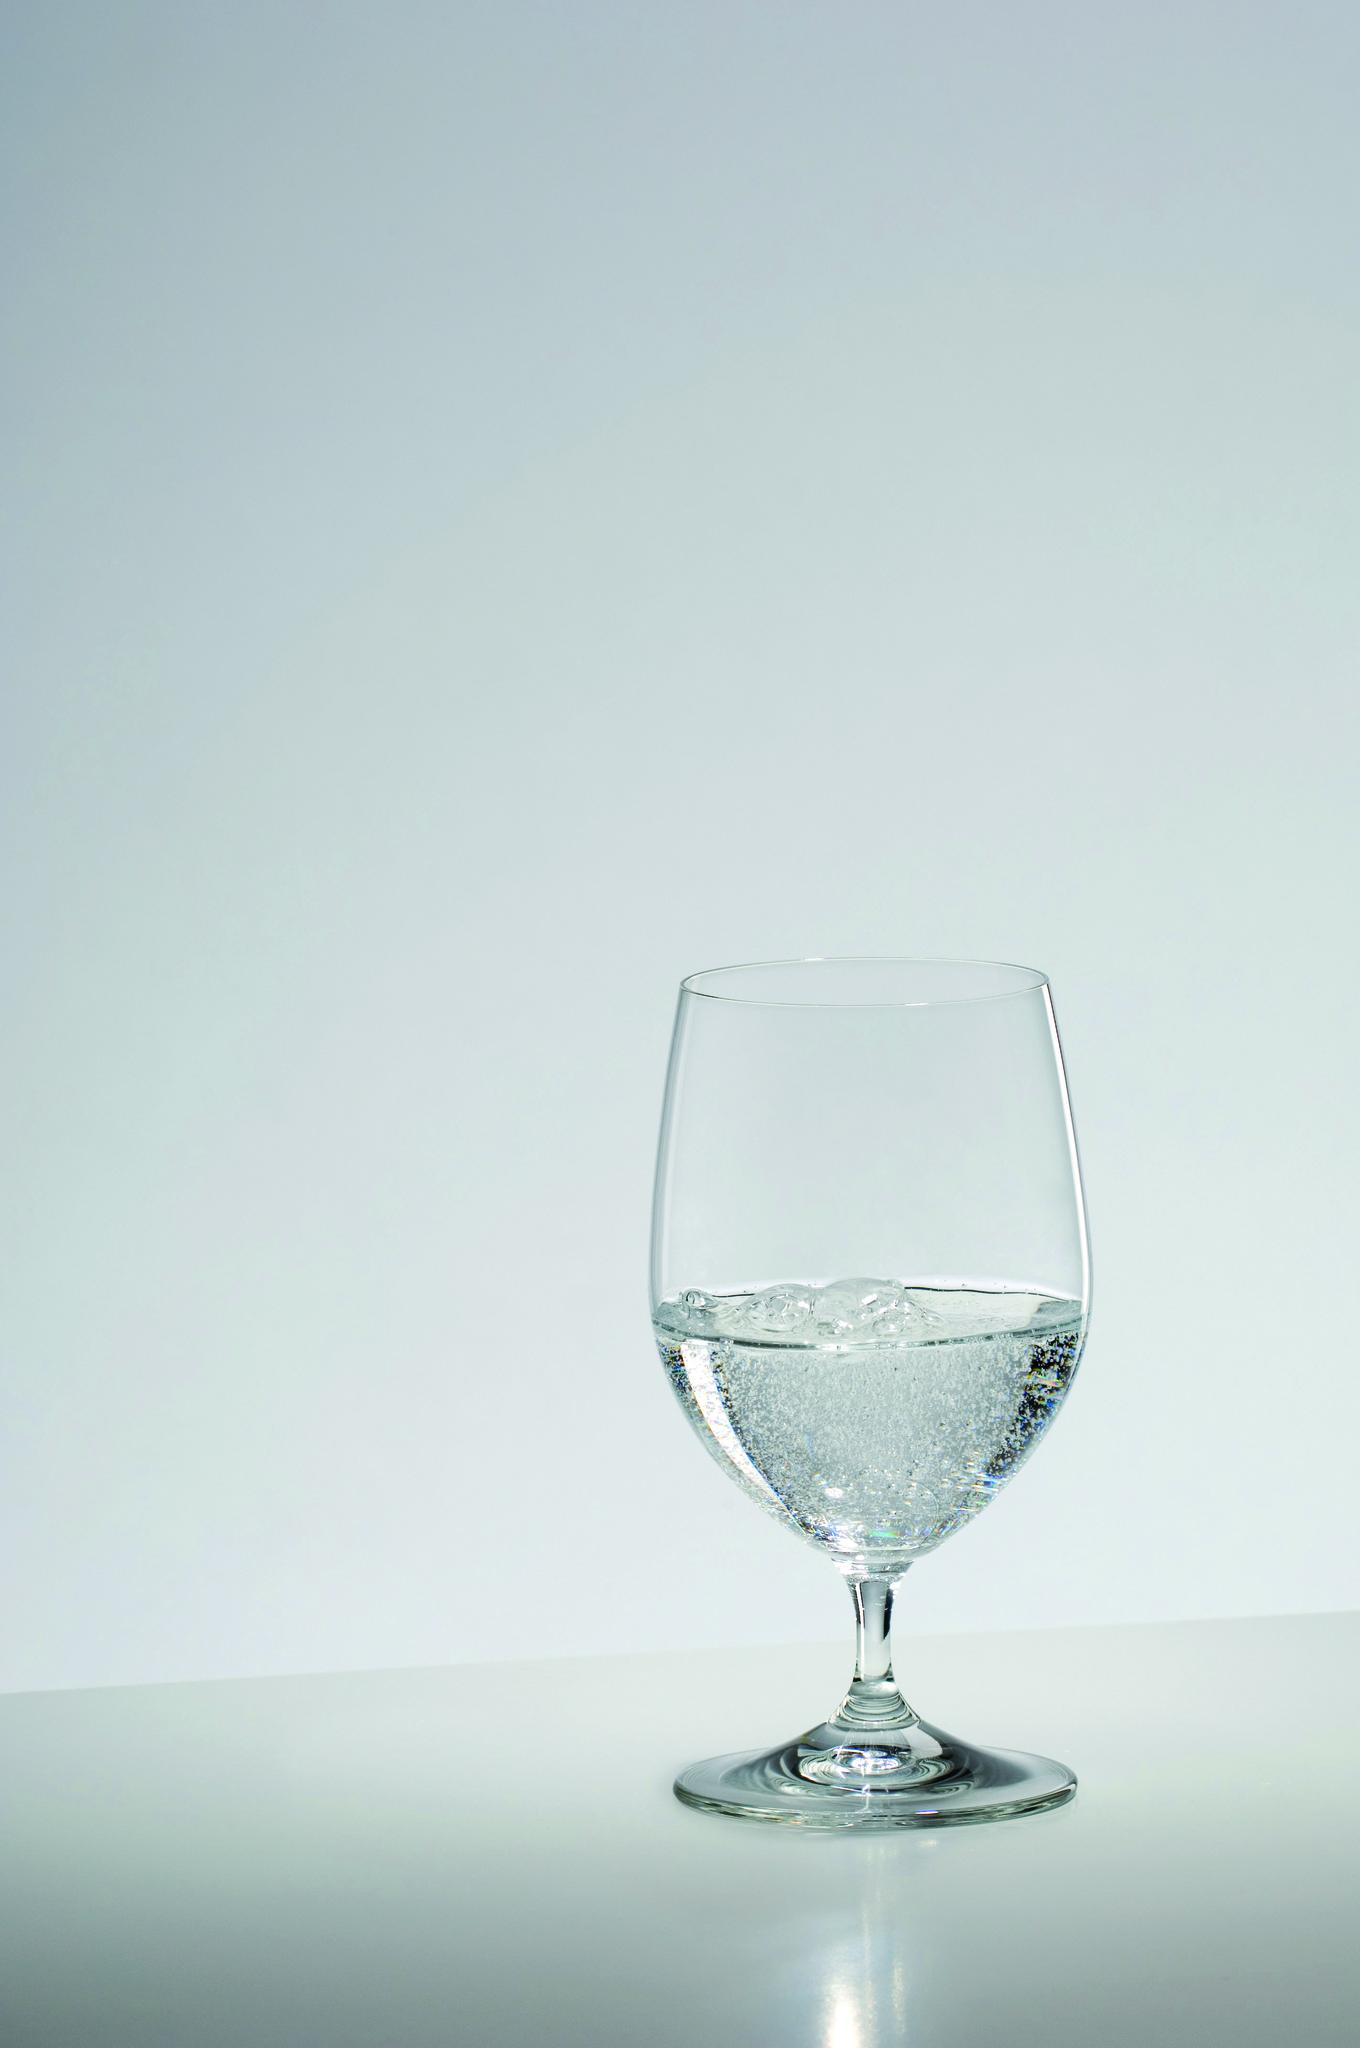 Бокалы Набор бокалов для воды 2шт 350мл Riedel Vinum Water 6416-02-_Water_Wasser.jpg